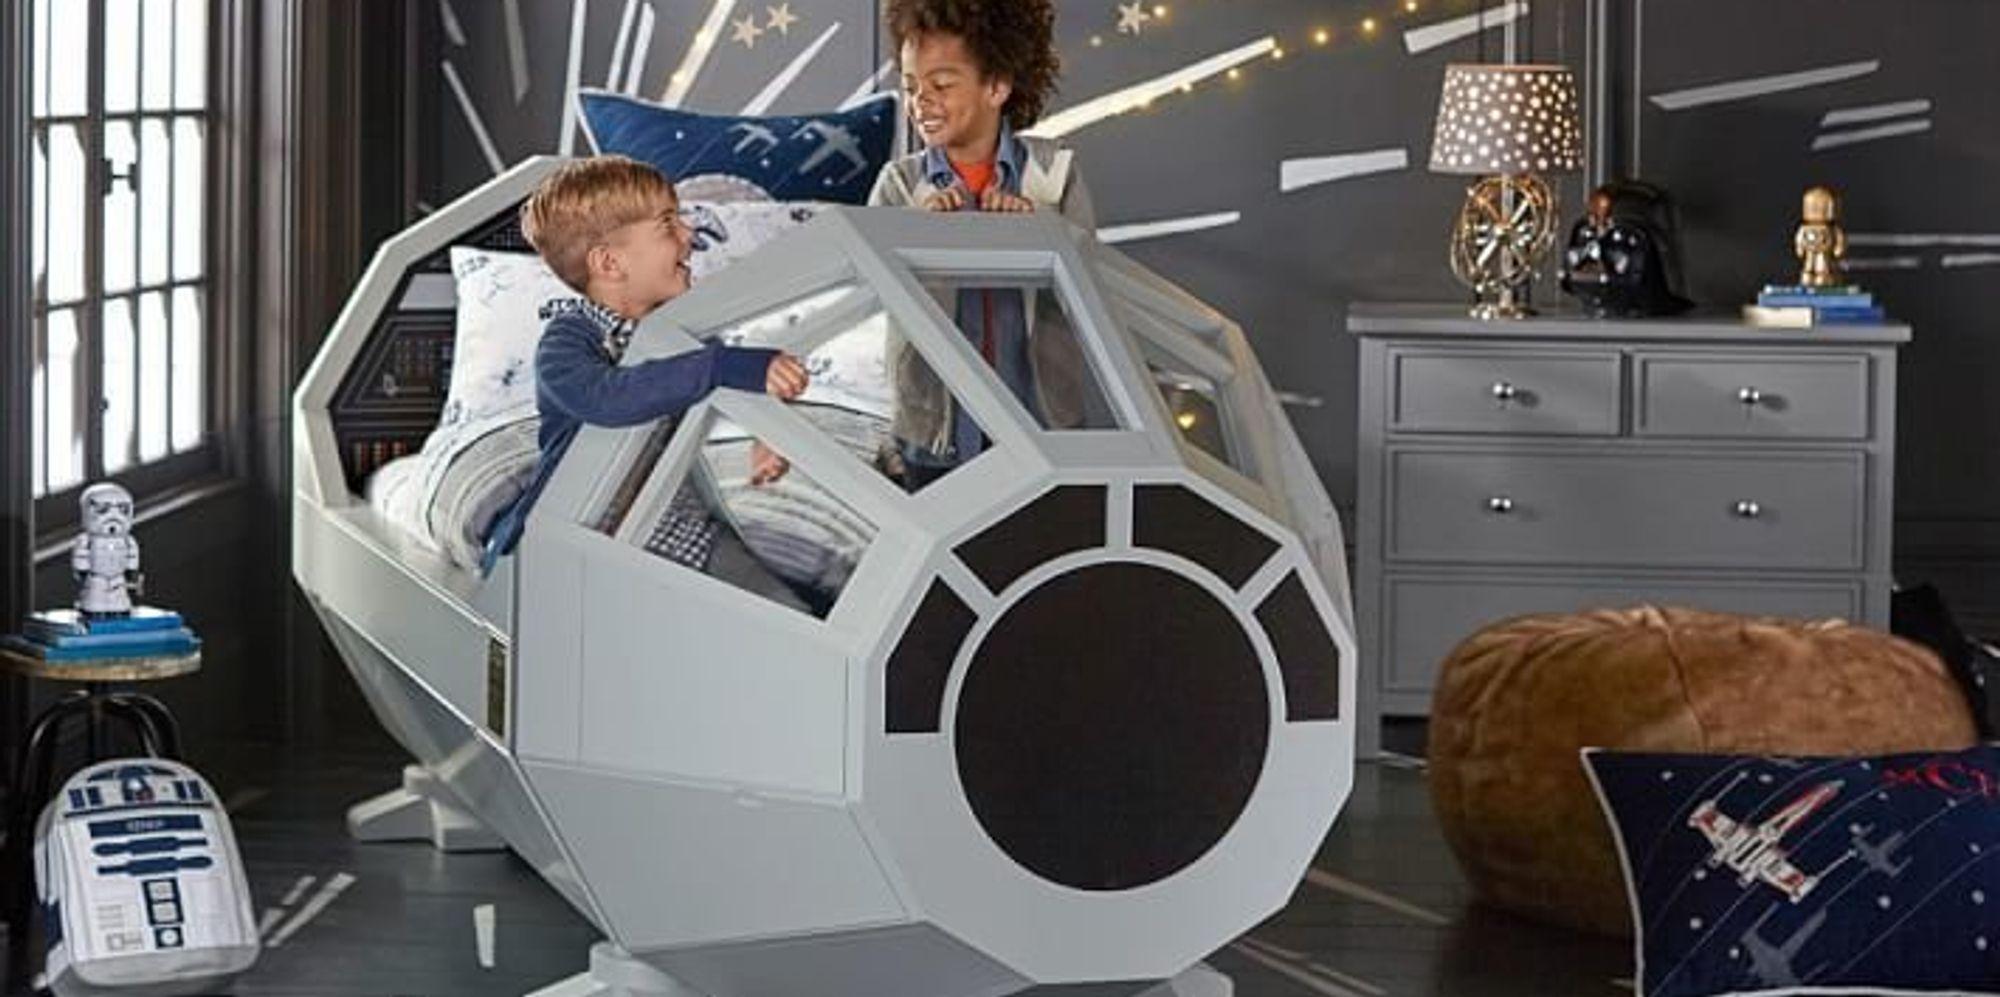 pottery barn sells millennium falcon 39 star wars 39 bed. Black Bedroom Furniture Sets. Home Design Ideas